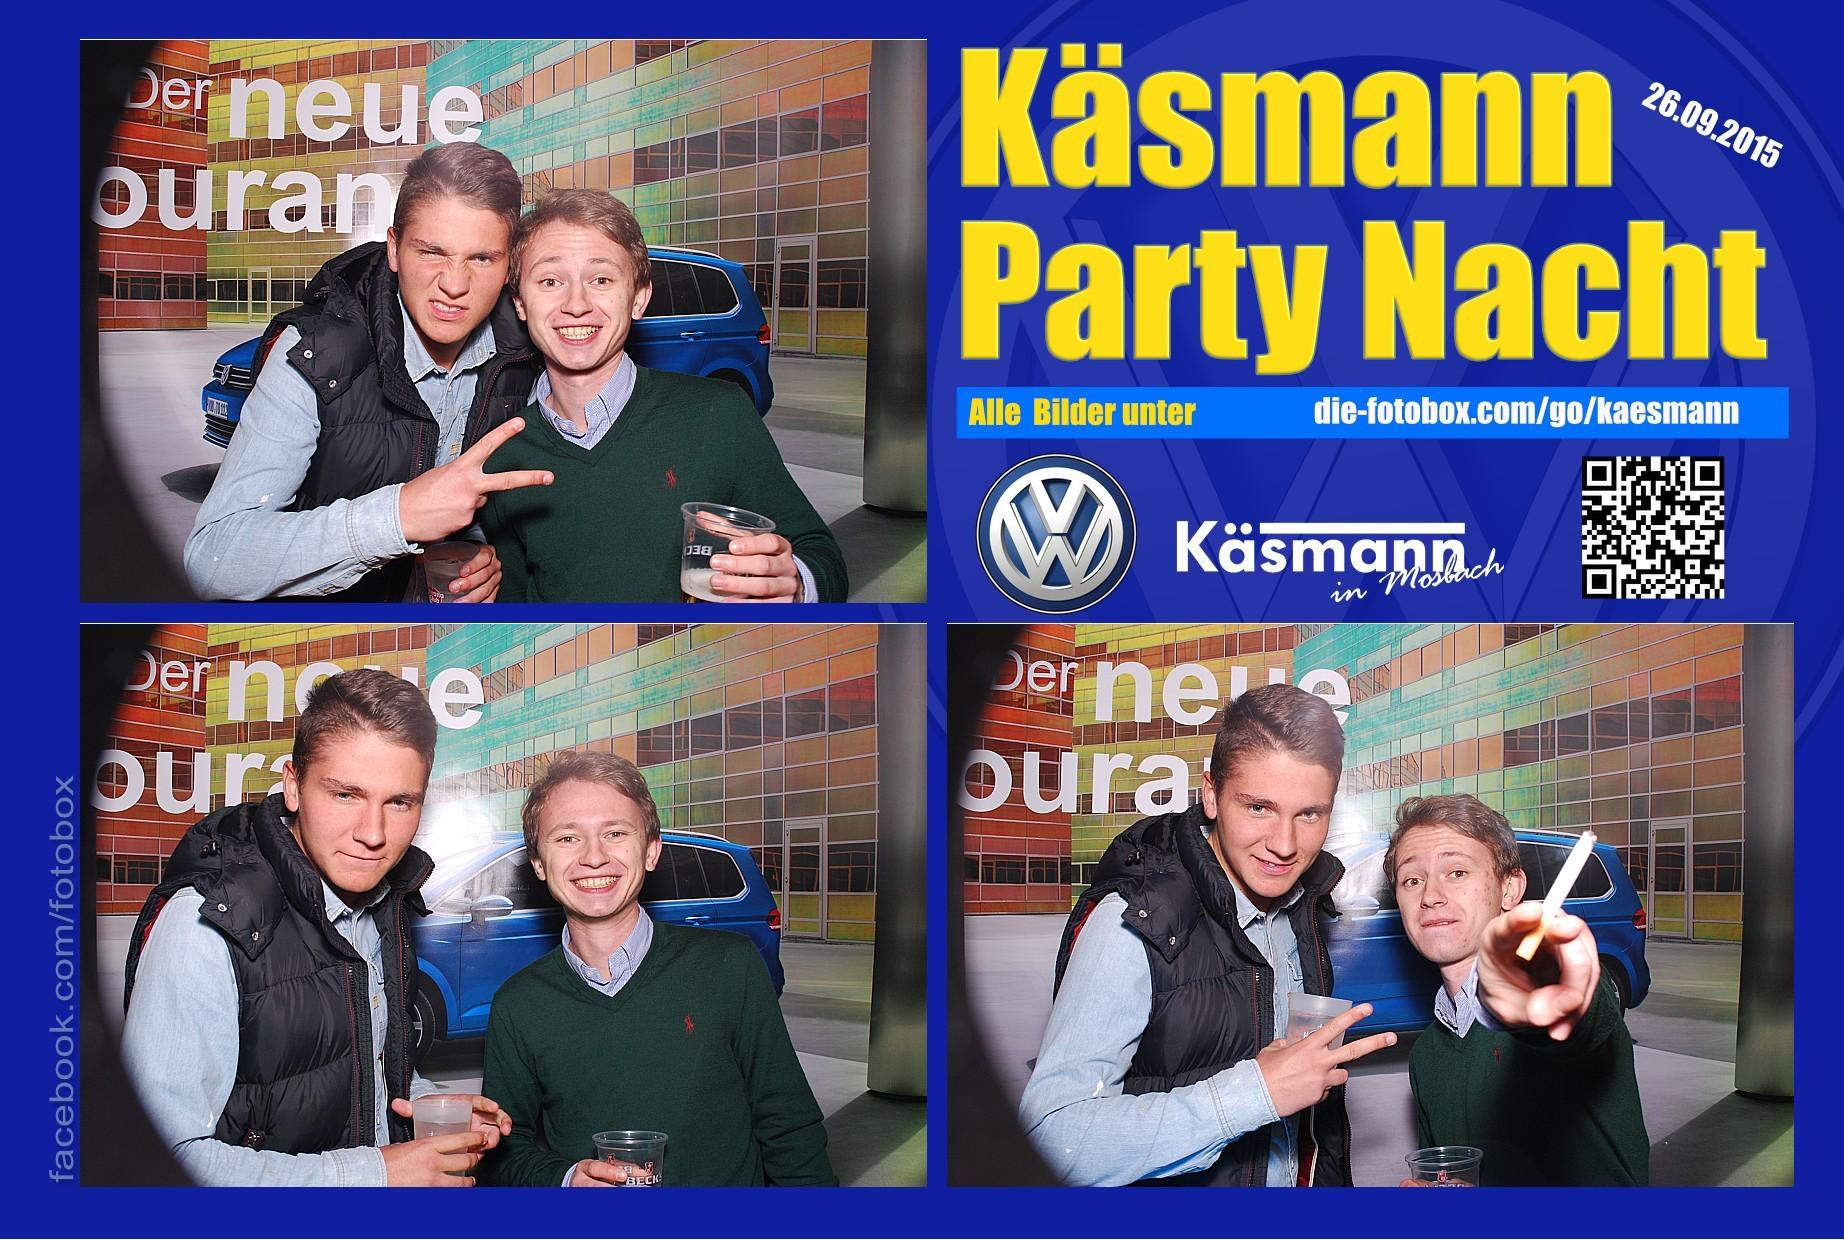 Käsmannparty 2015 - www.die-fotobox.com 01156